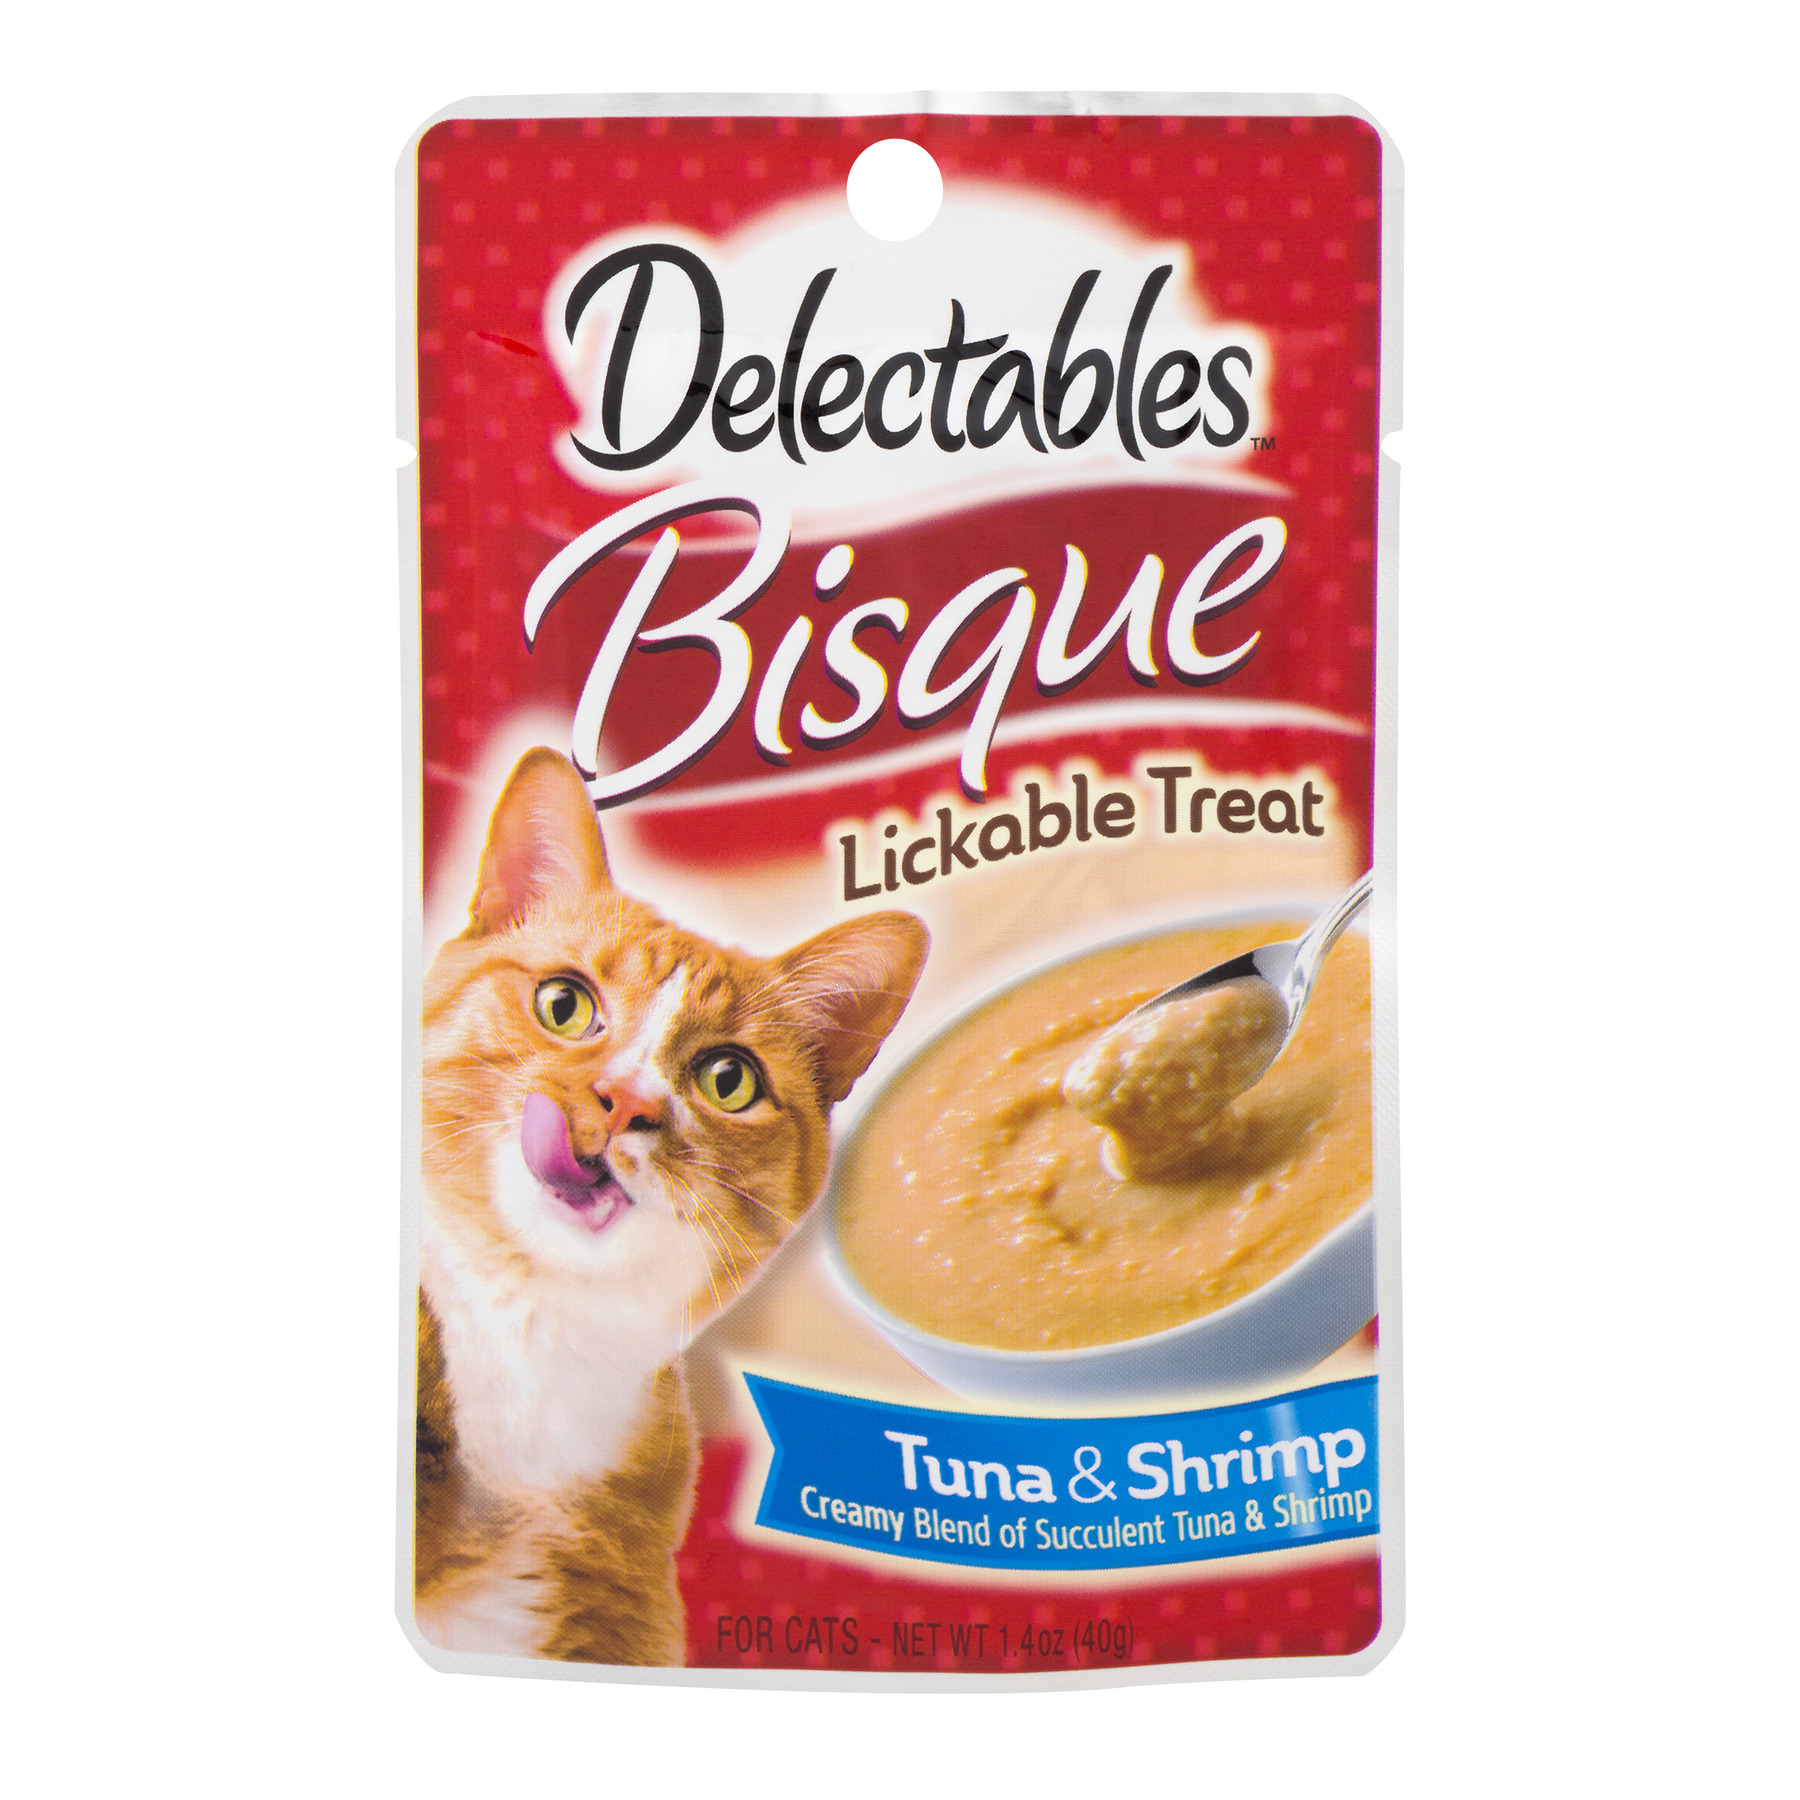 Delectables Lickable Cat Treat Bisque Tuna & Shrimp, 1.4 Oz. by The Hartz Mountain Corporation